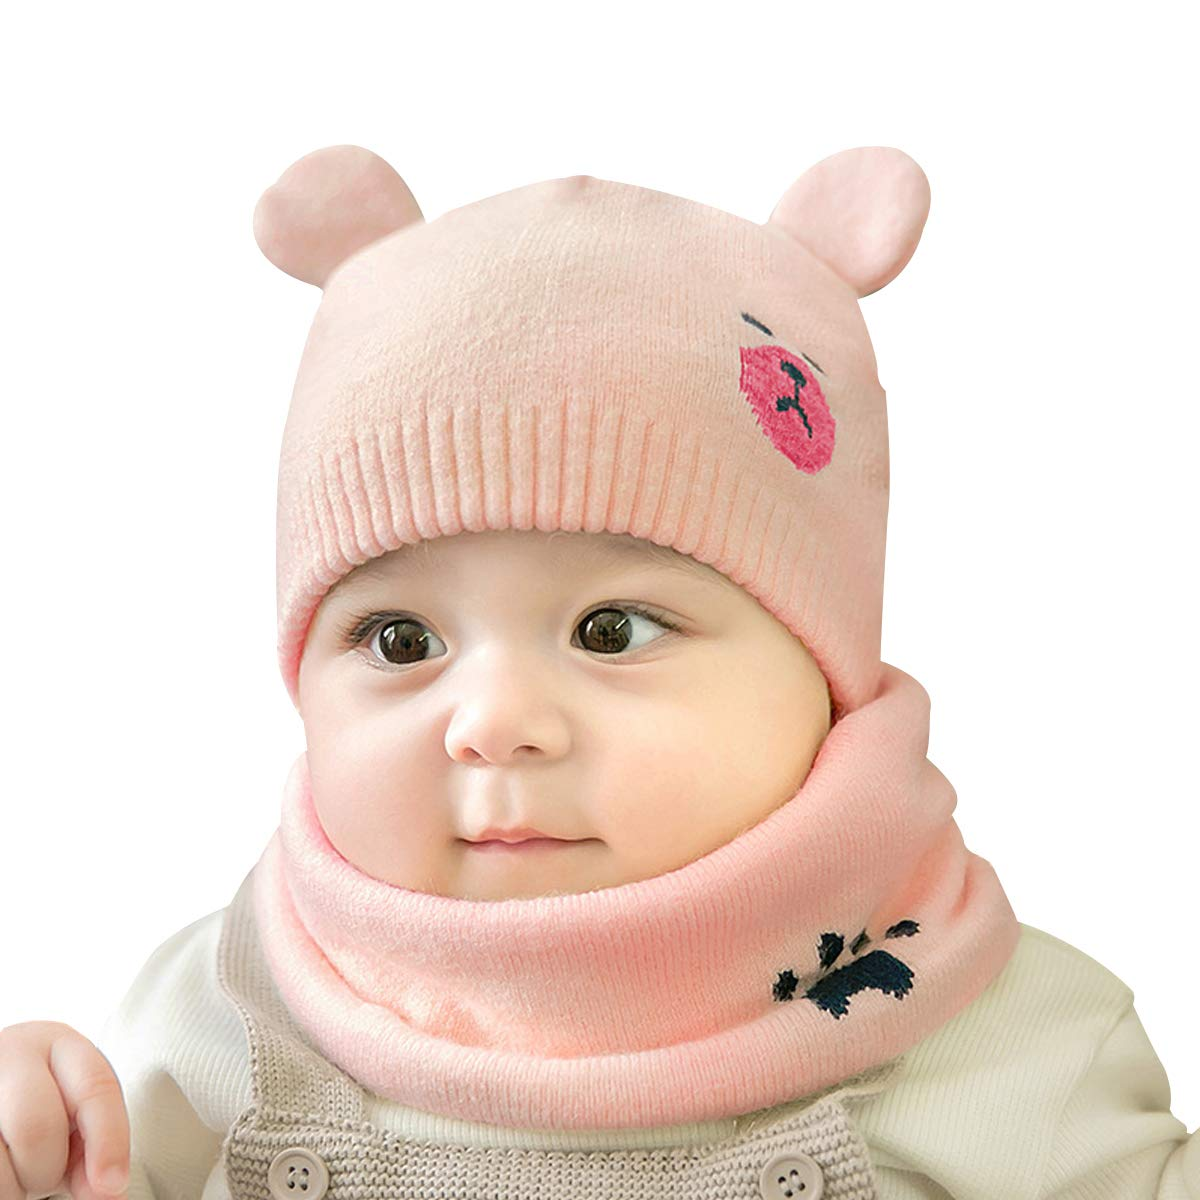 734fcdccf431b cjixnji Baby Boy Girl Cute Baby Winter Hats Scarfs Set